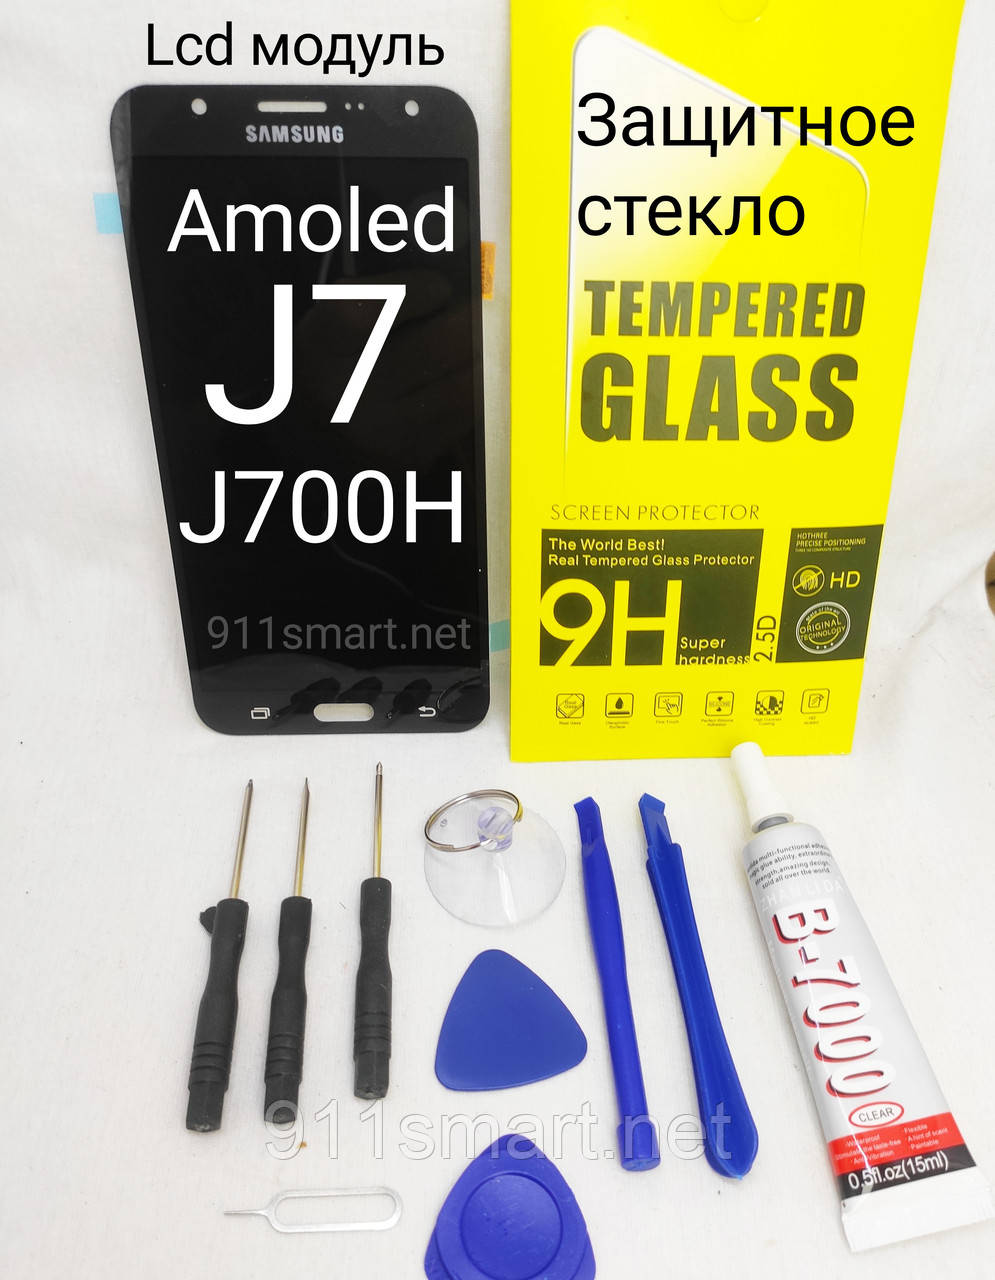 Дисплейный модуль LCD экран для Samsung Galaxy J7 j700h Amoled